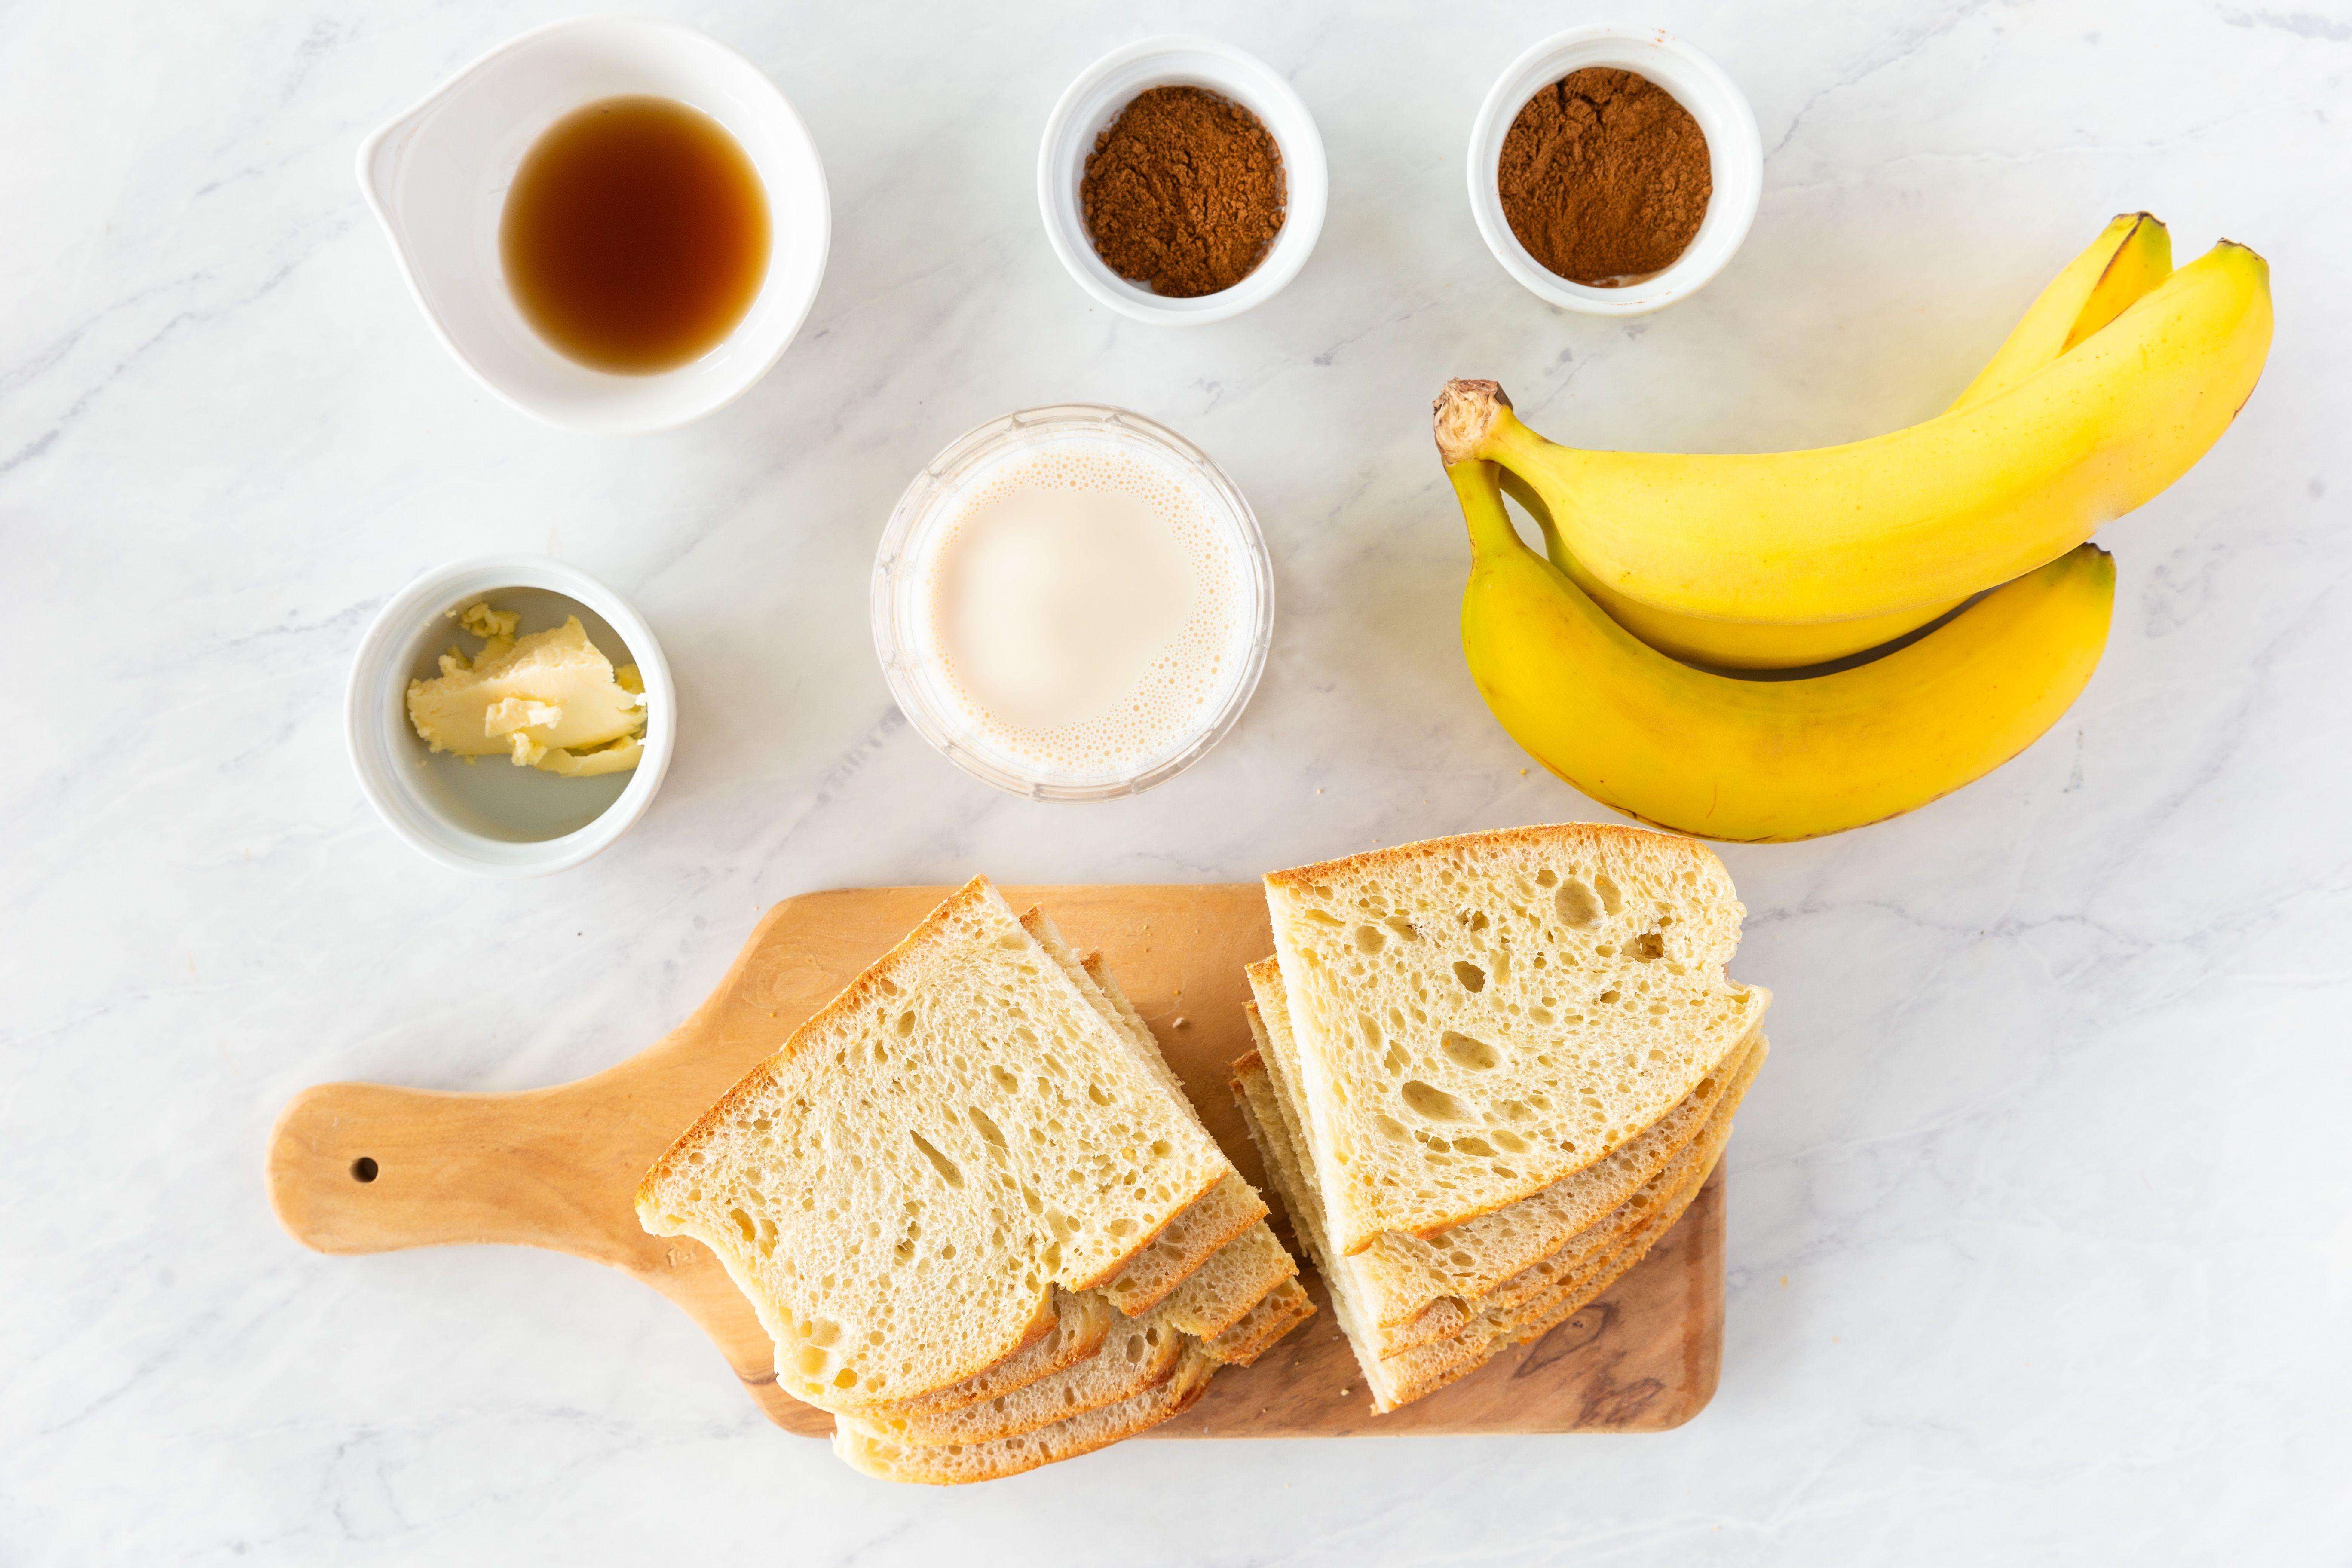 Vegan french toast recipes